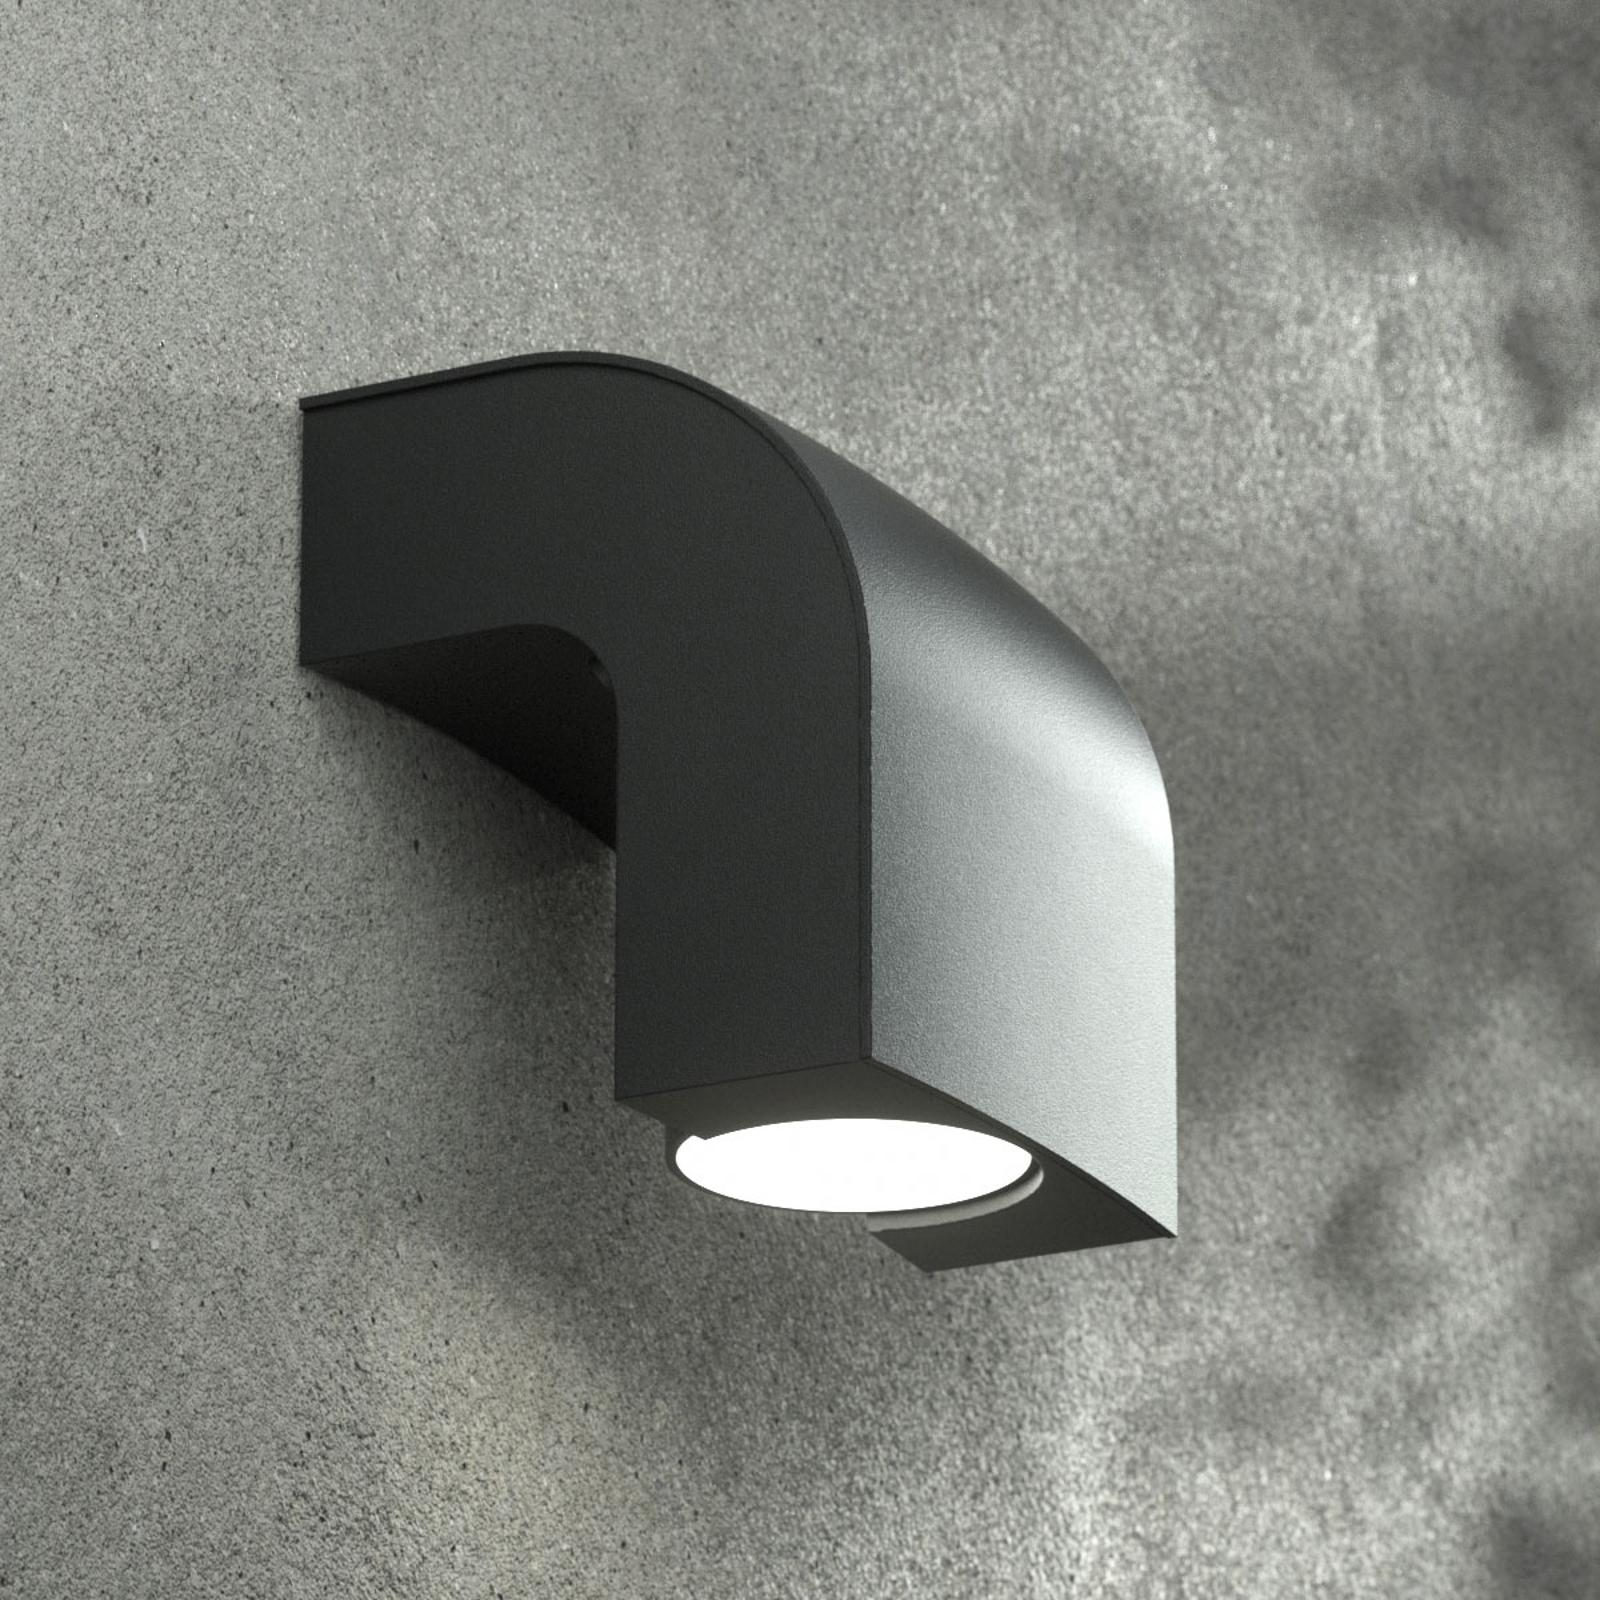 KLAMP outdoor wall light, height 13cm, one-bulb_3505215_1